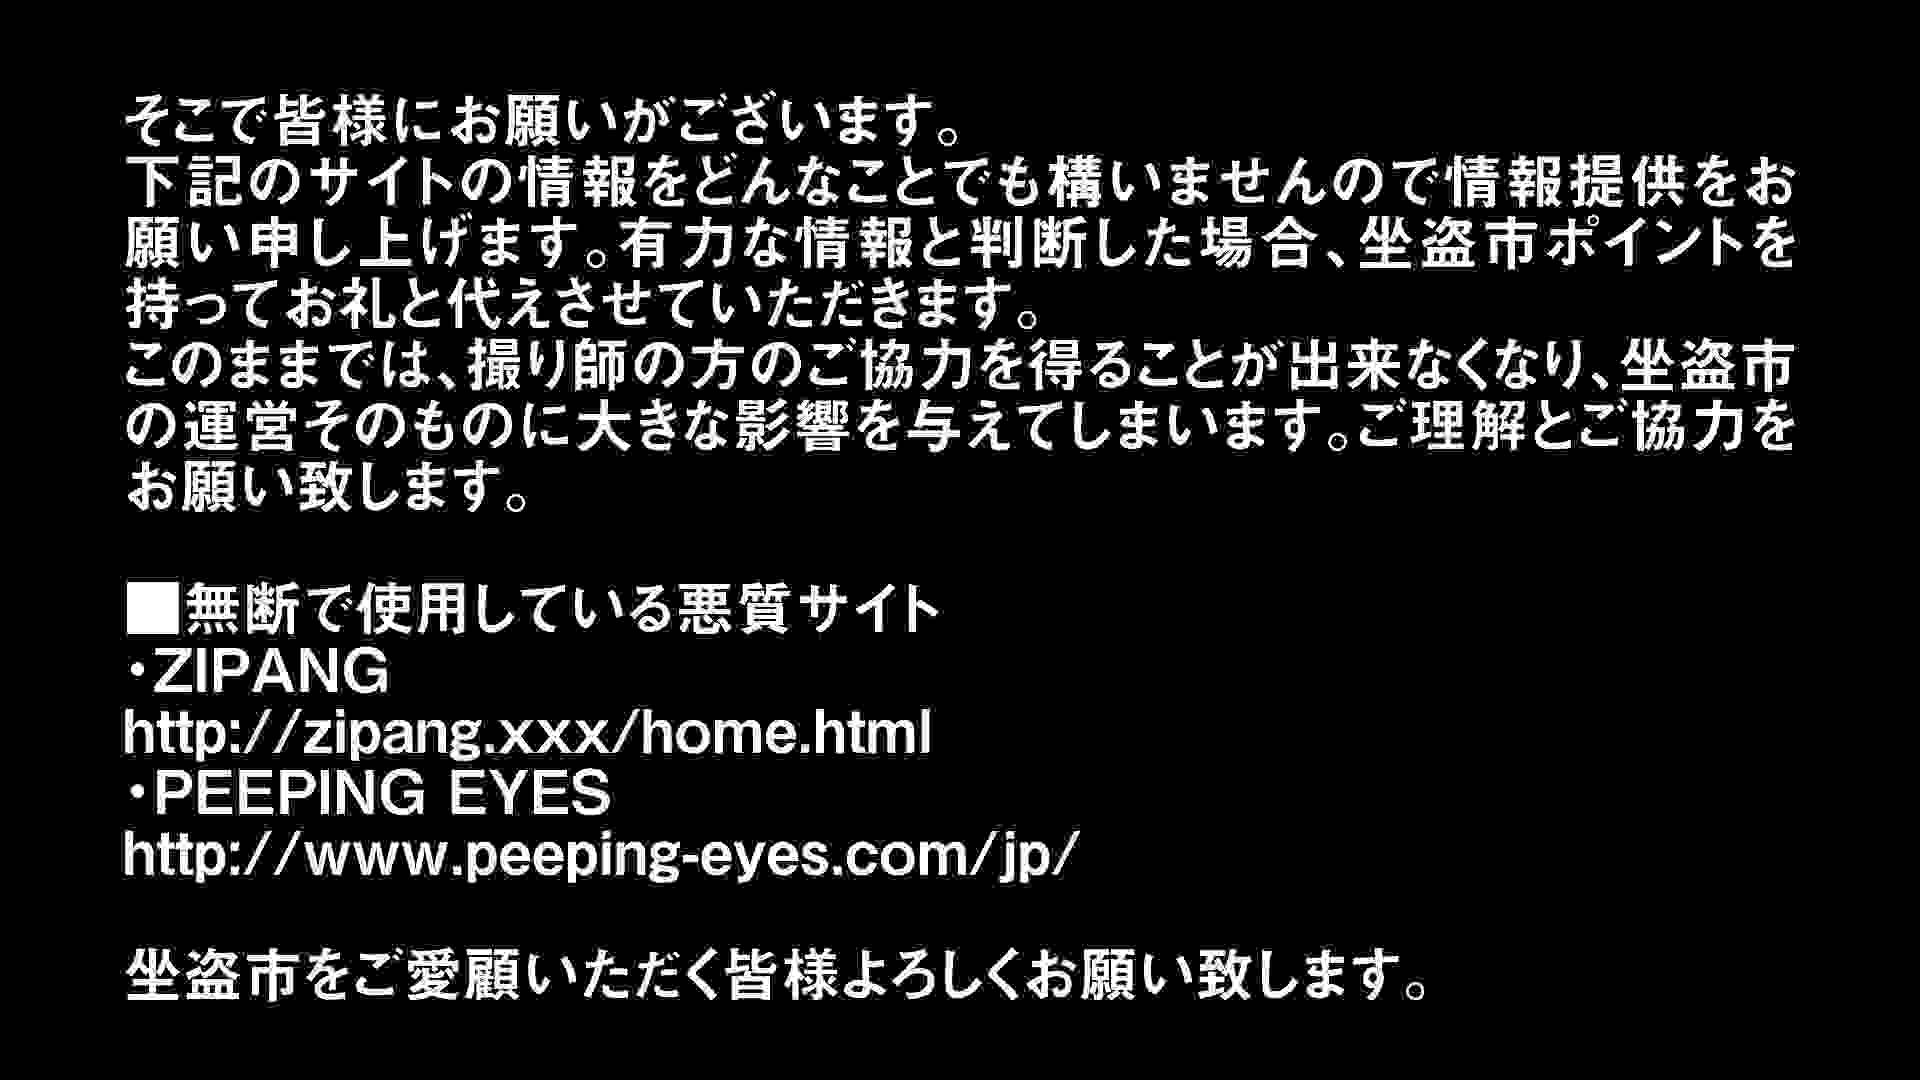 Aquaな露天風呂Vol.297 OLセックス 隠し撮りオマンコ動画紹介 103画像 38